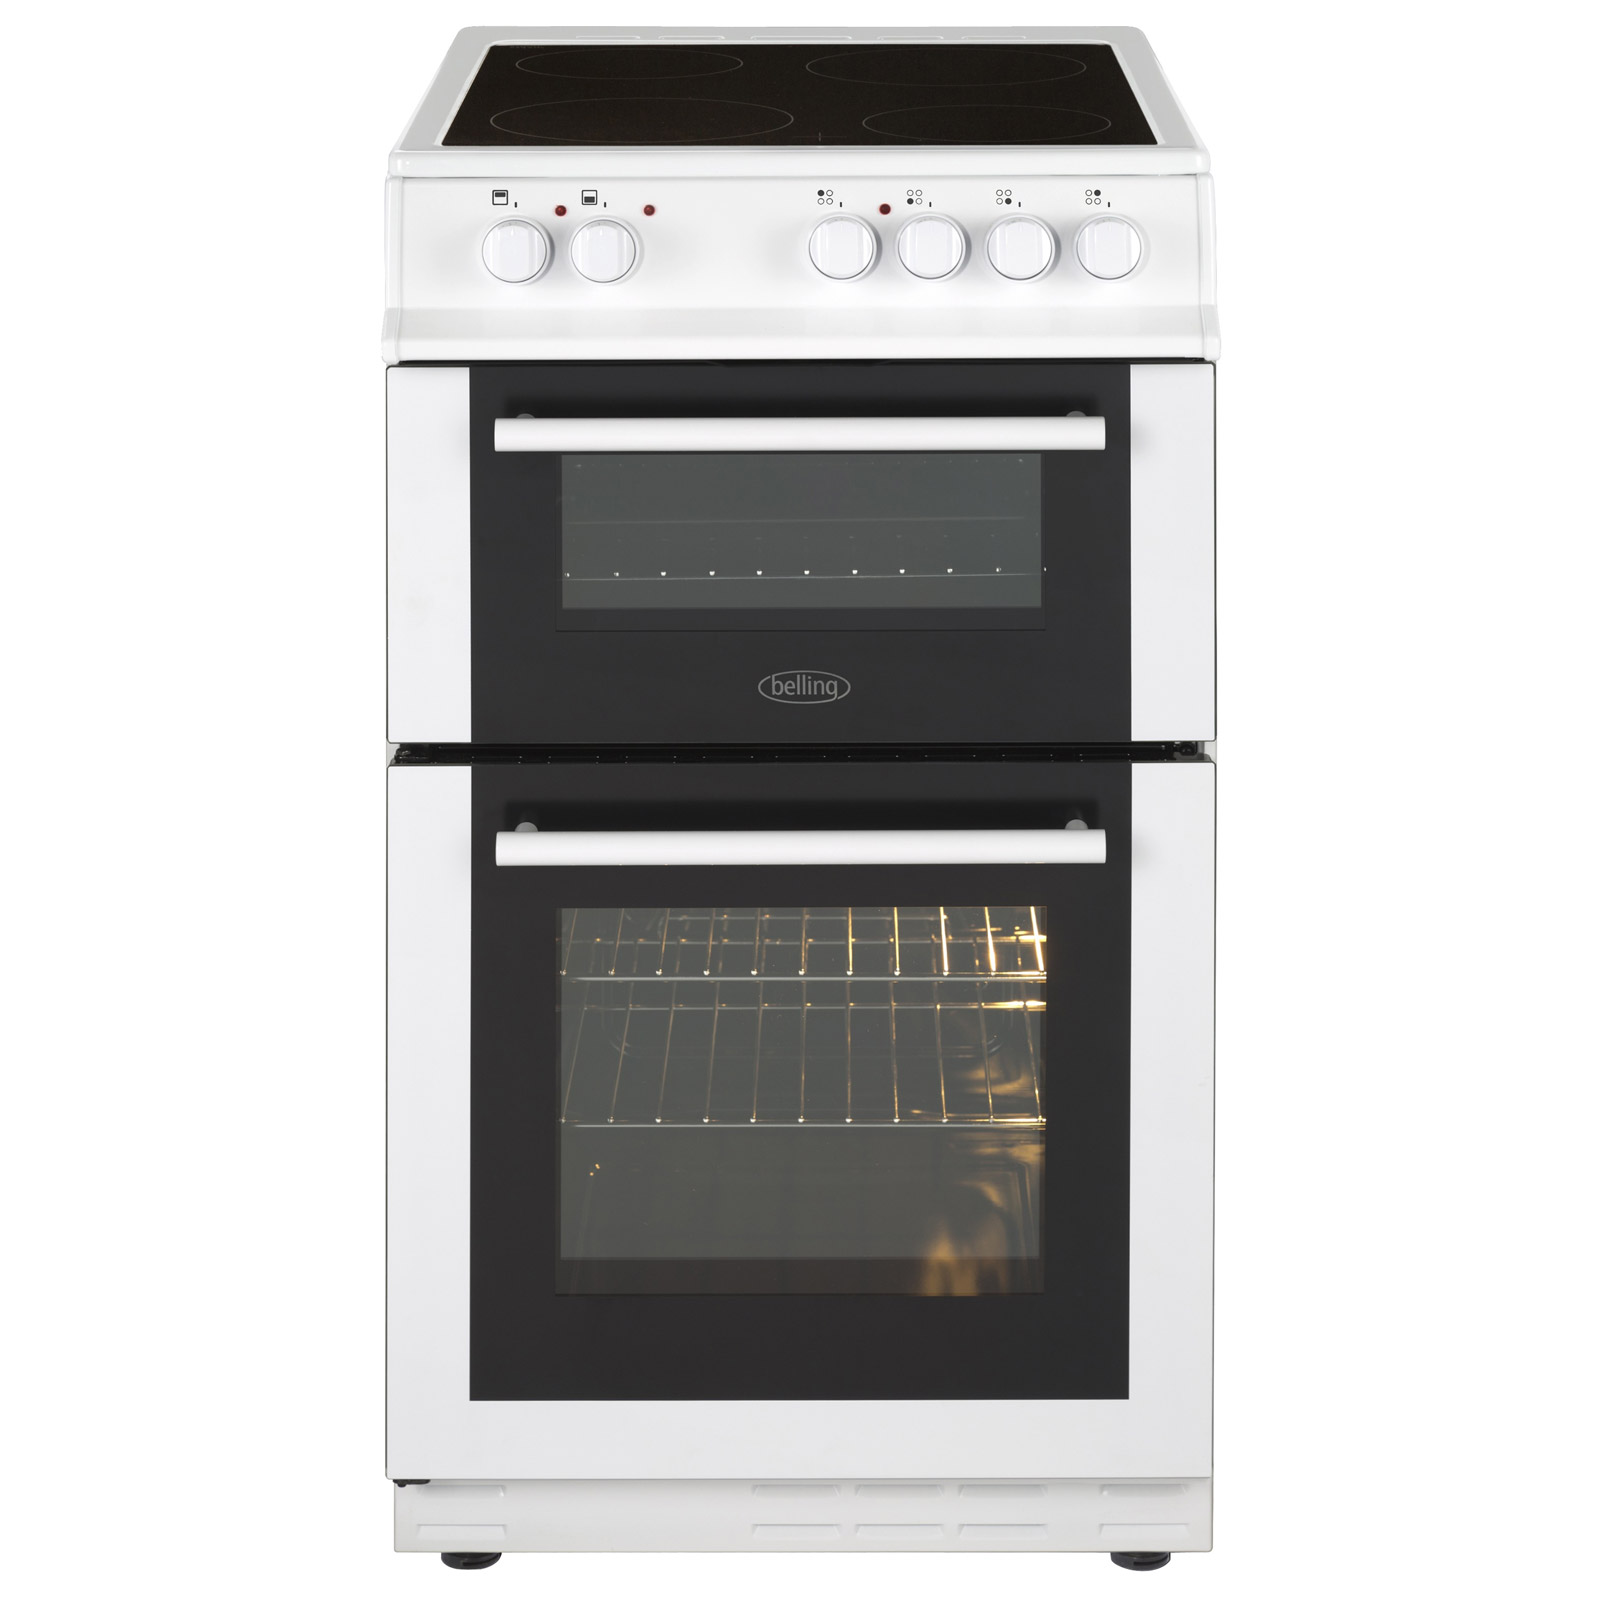 white electric range. Belling FS50EDOFCWHI 50cm Double Oven Electric Cooker In White, Ceramic Hob White Range